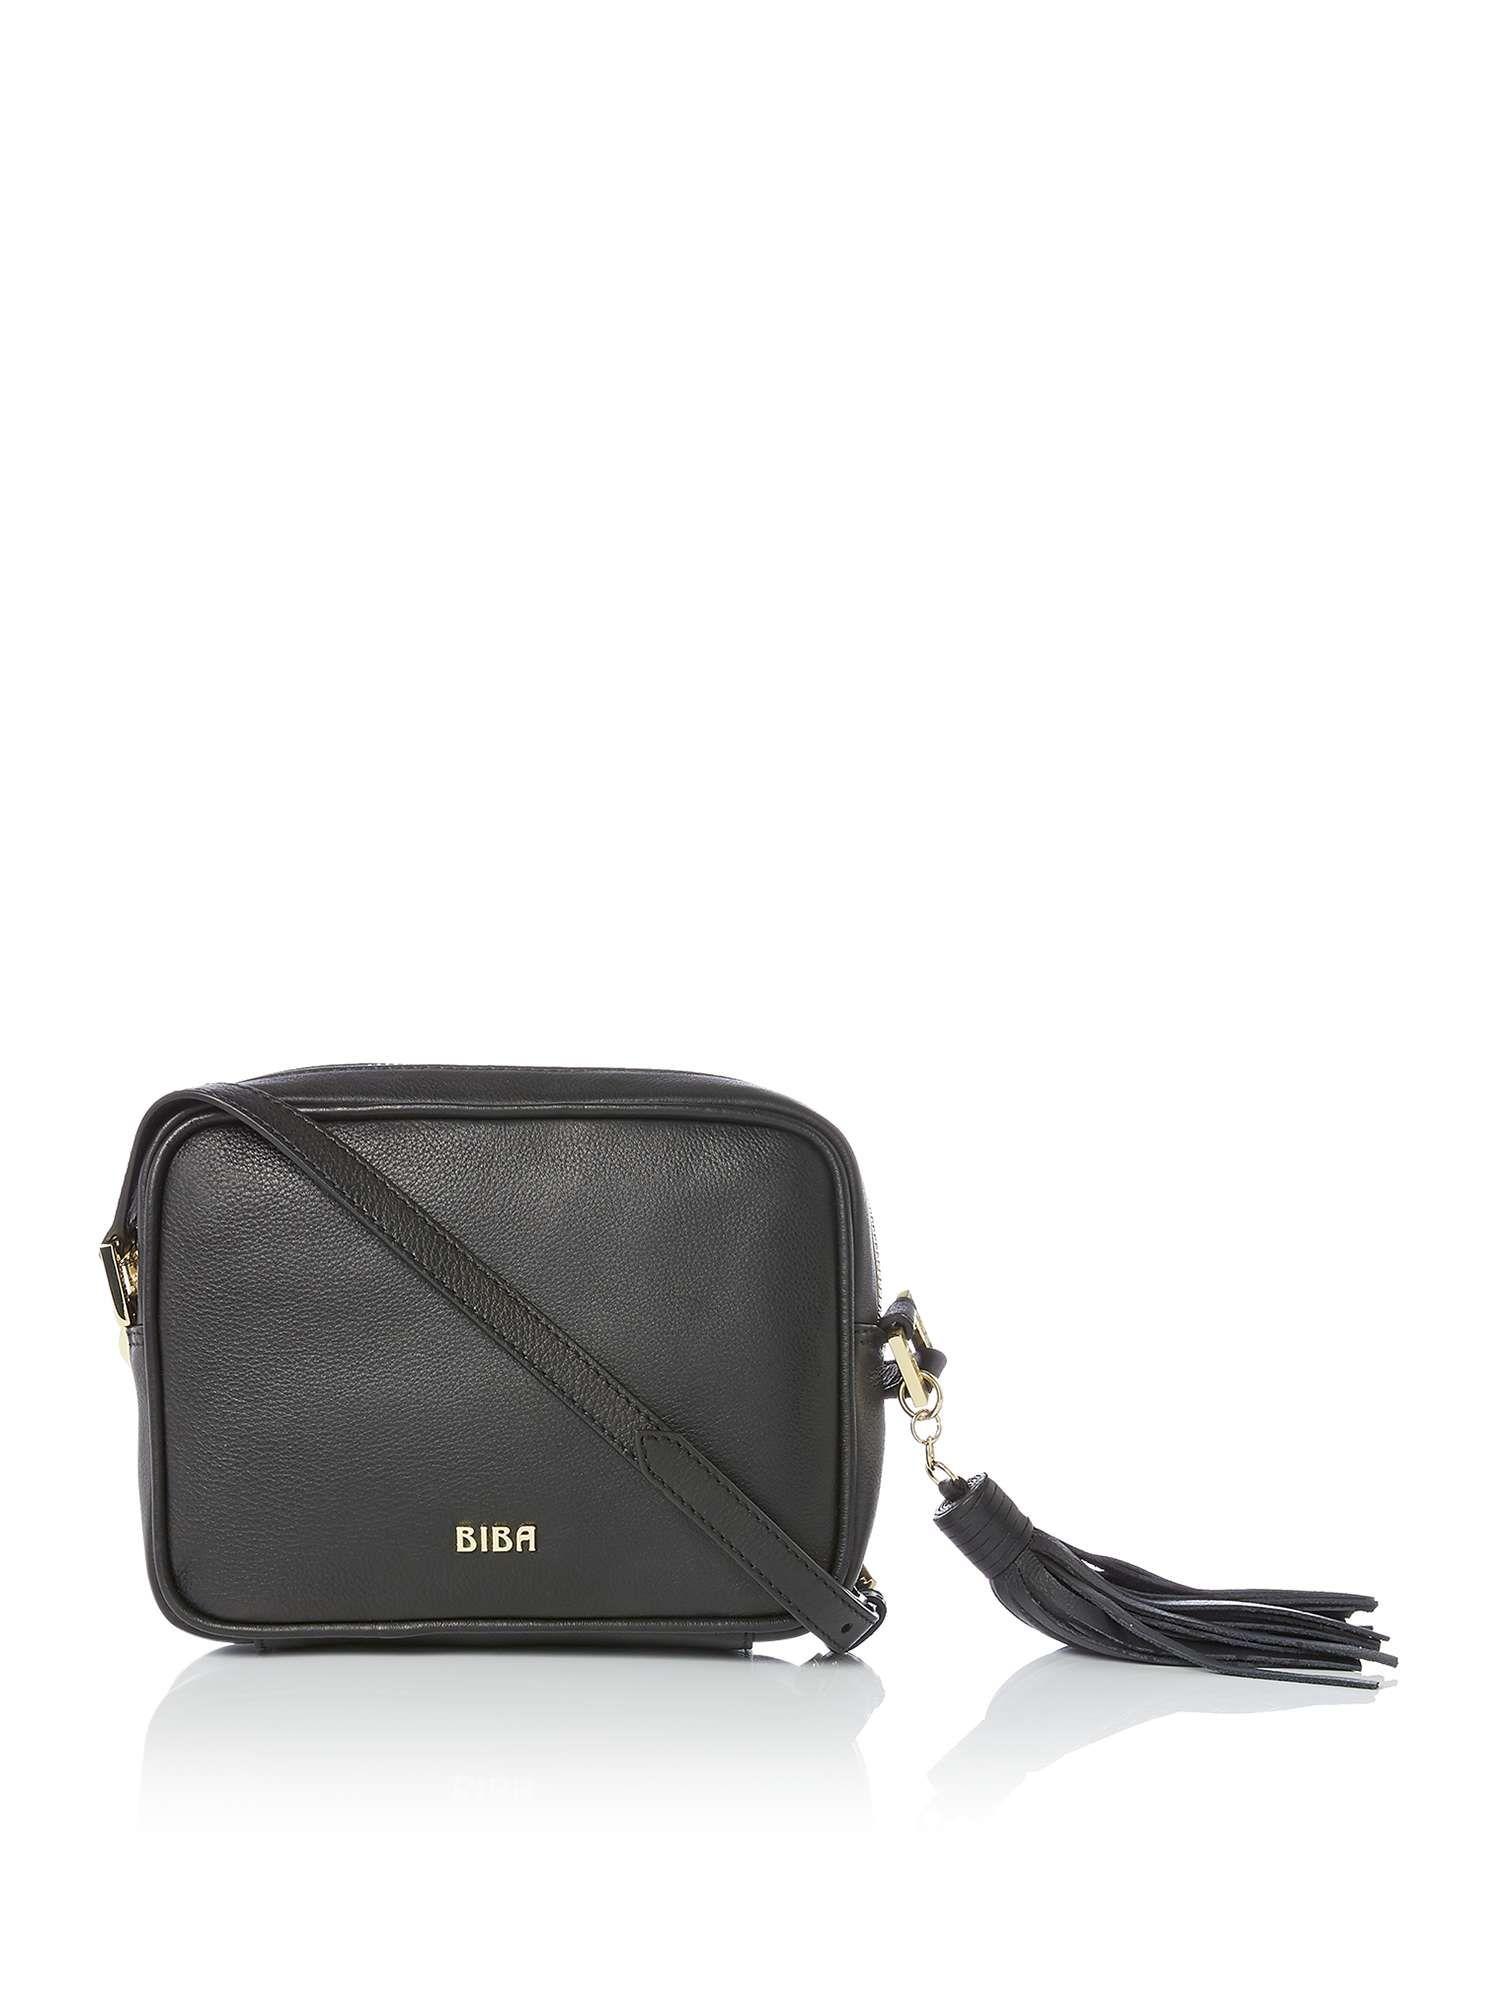 Biba Mini Frances Crossbody Leather Bag House Of Fraser